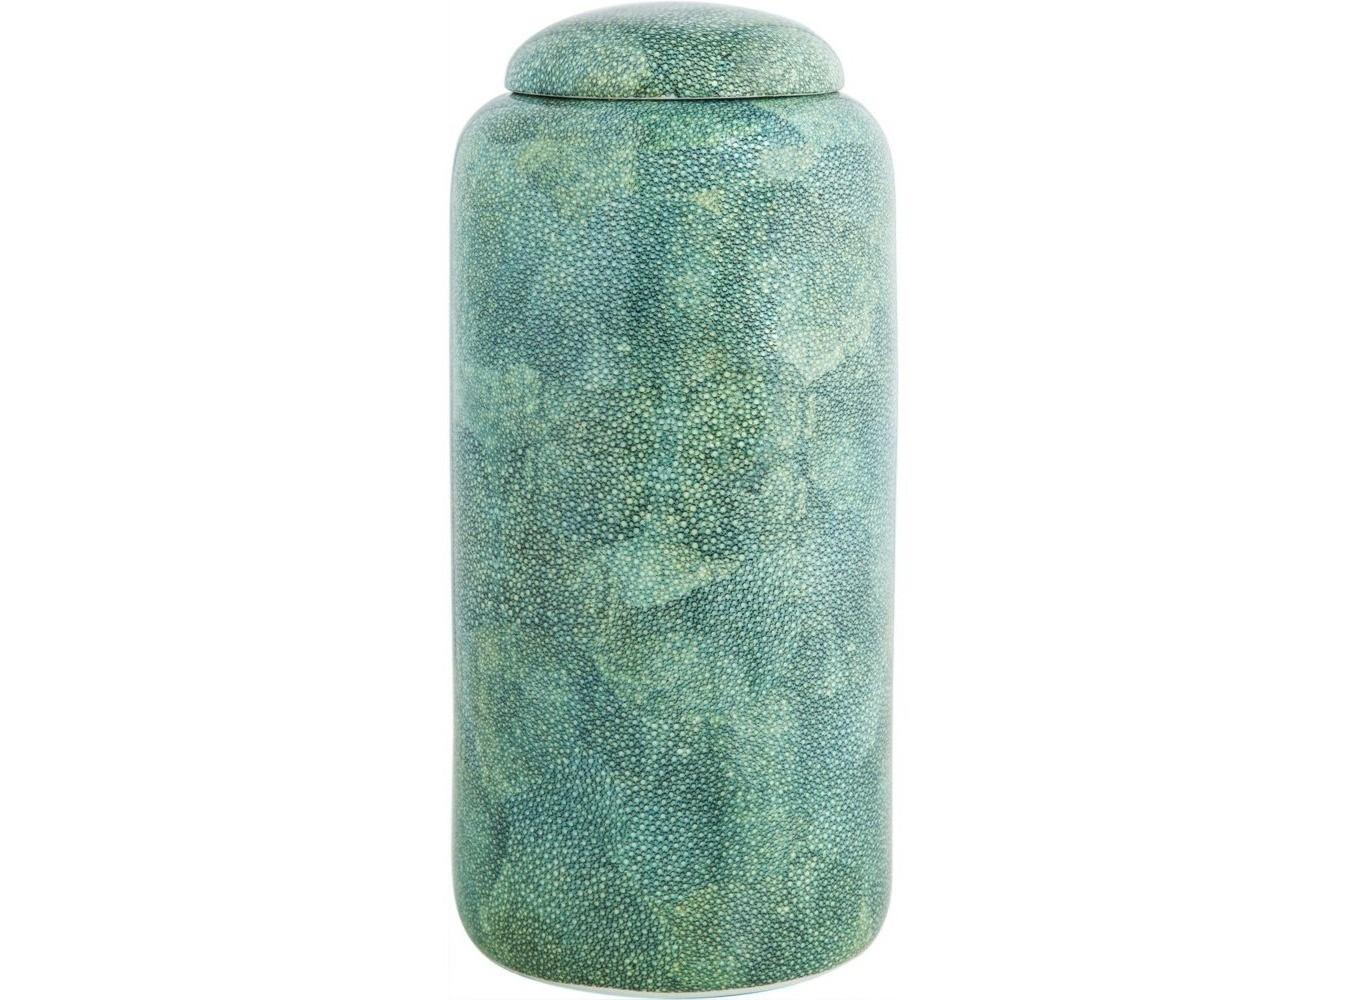 Ваза настольная AnacondaВазы<br><br><br>Material: Керамика<br>Высота см: 35.0